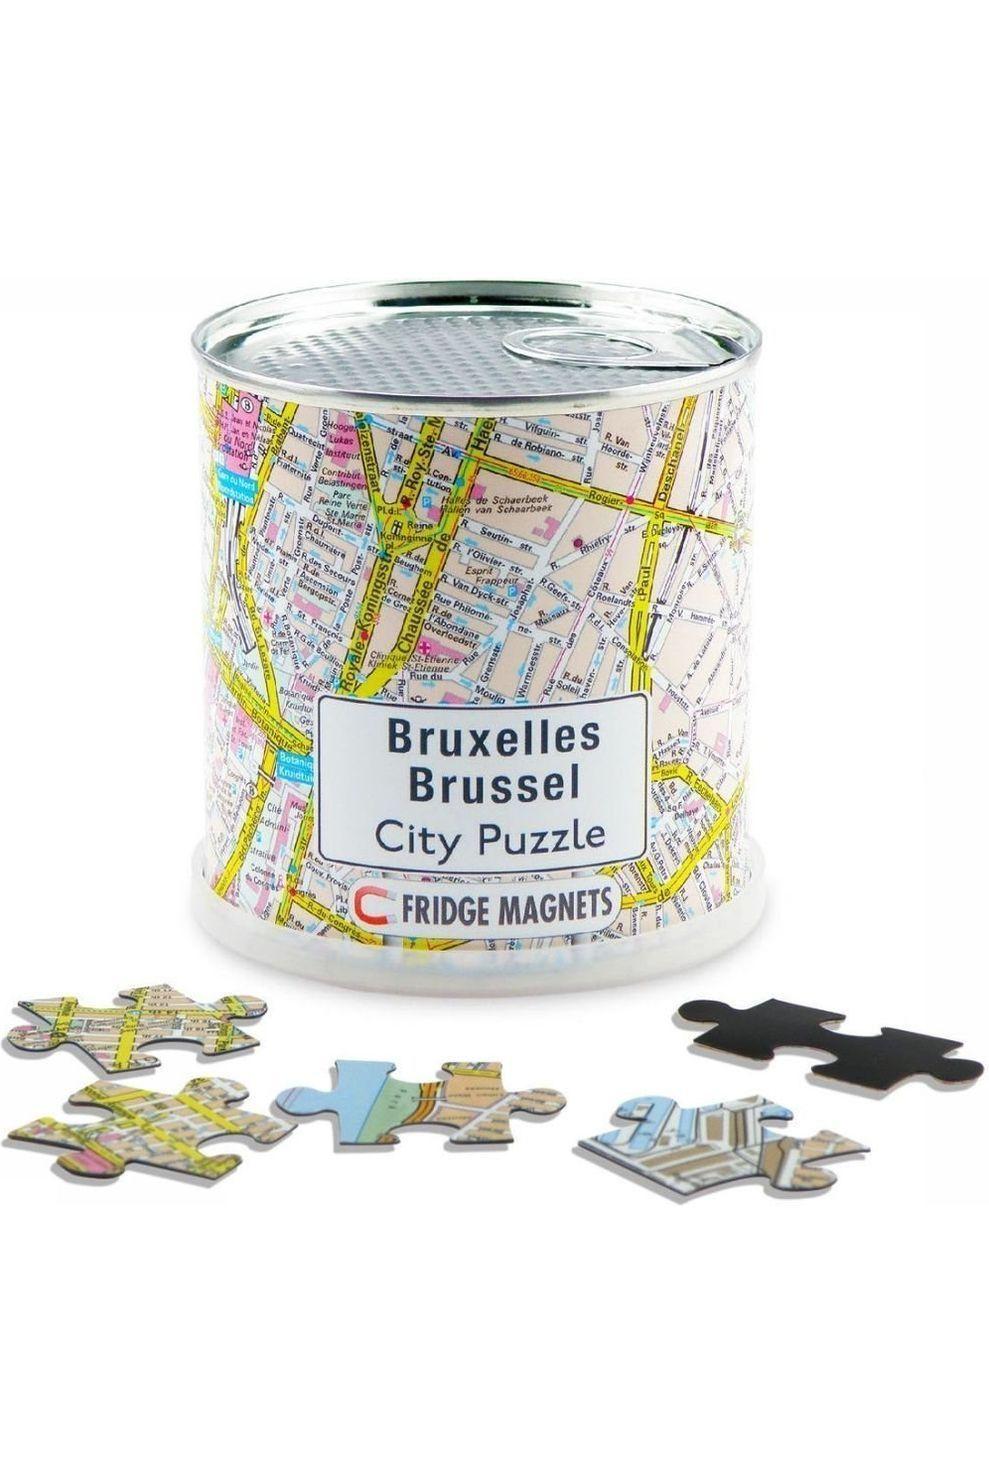 EXTRAGOODS Reisboek Brussel city puzzle magnets - 2015